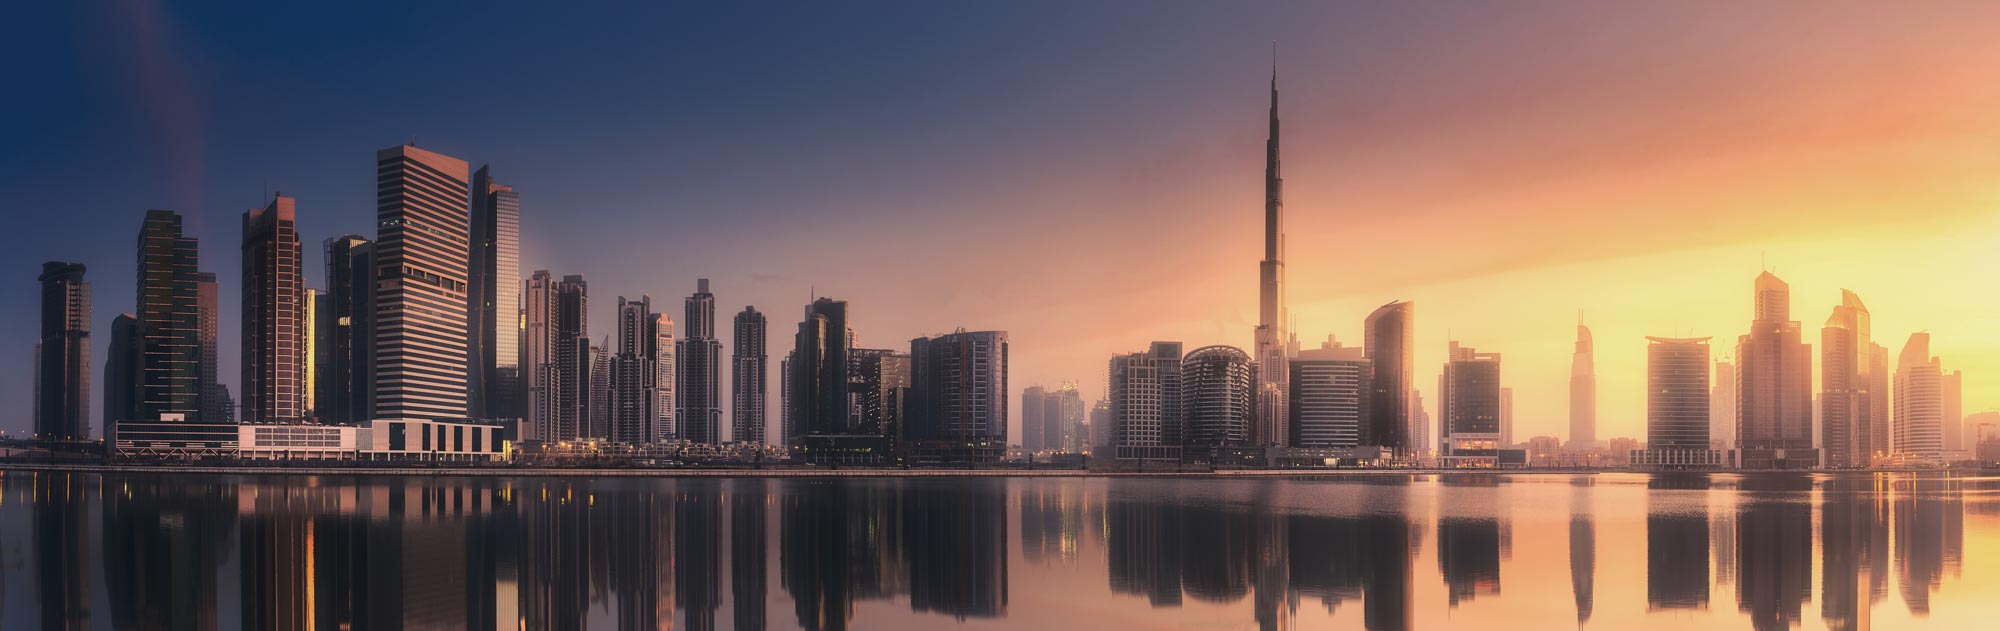 Contact The Talent Refinery in Dubai (UAE)